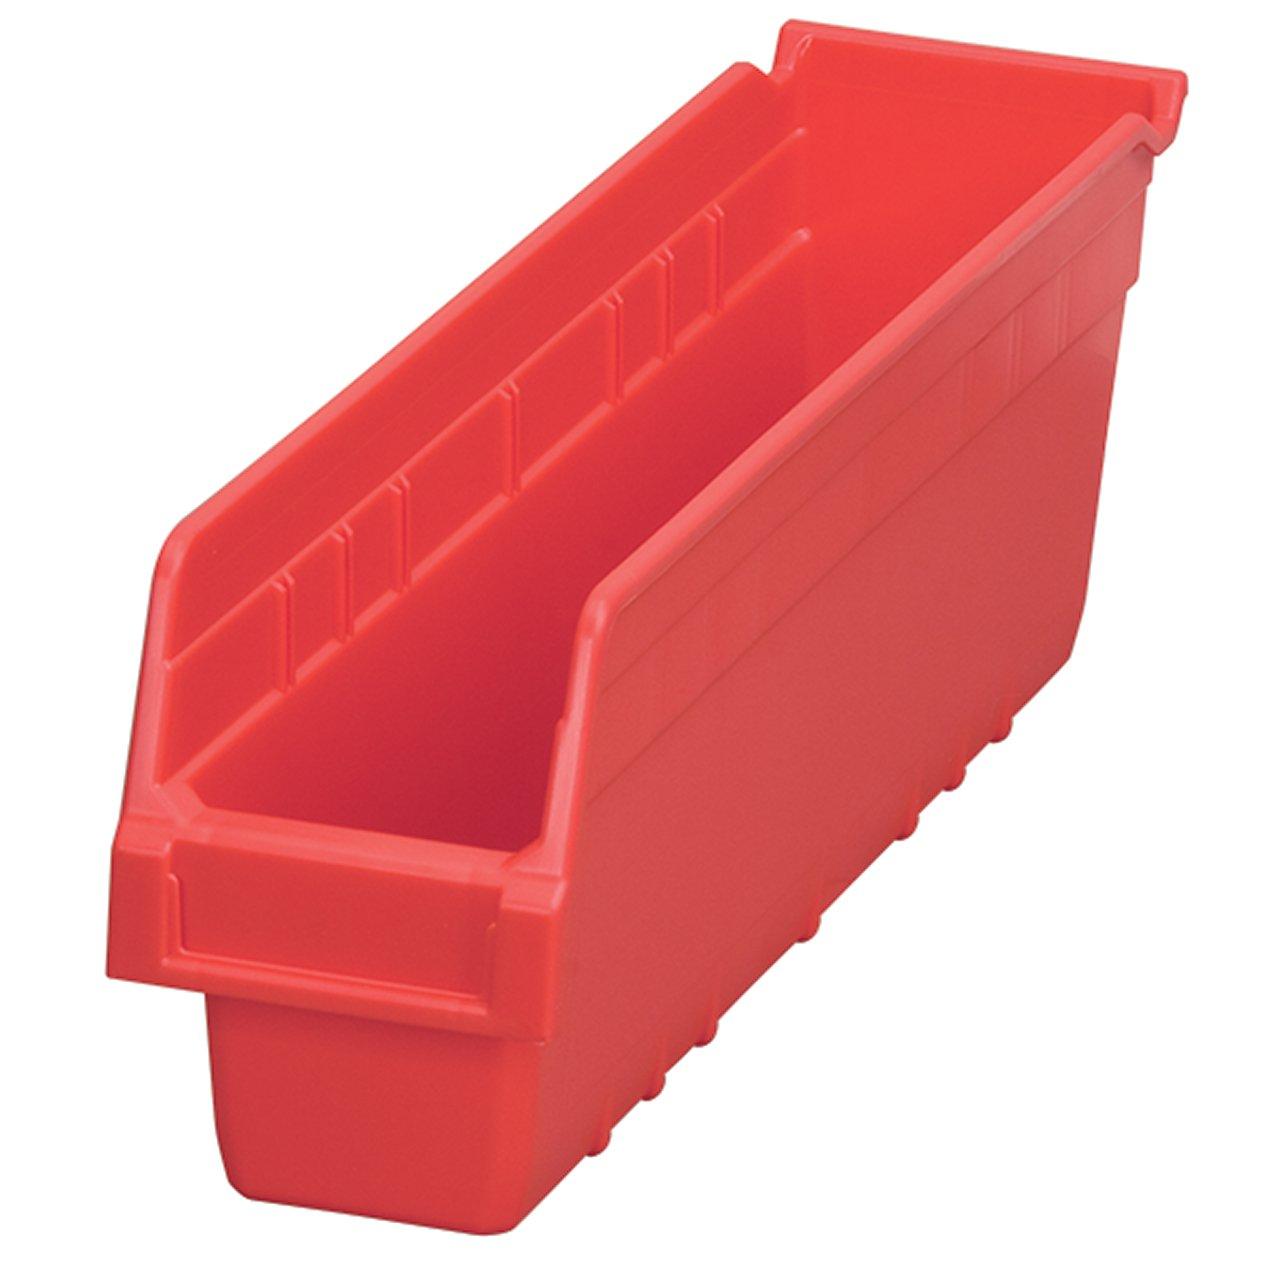 Akro-Mils 30048 ShelfMax Plastic Nesting Shelf Bin Box, 18-Inch Length x 4-Inch Width x 6-Inch Height, Case of 8, Red